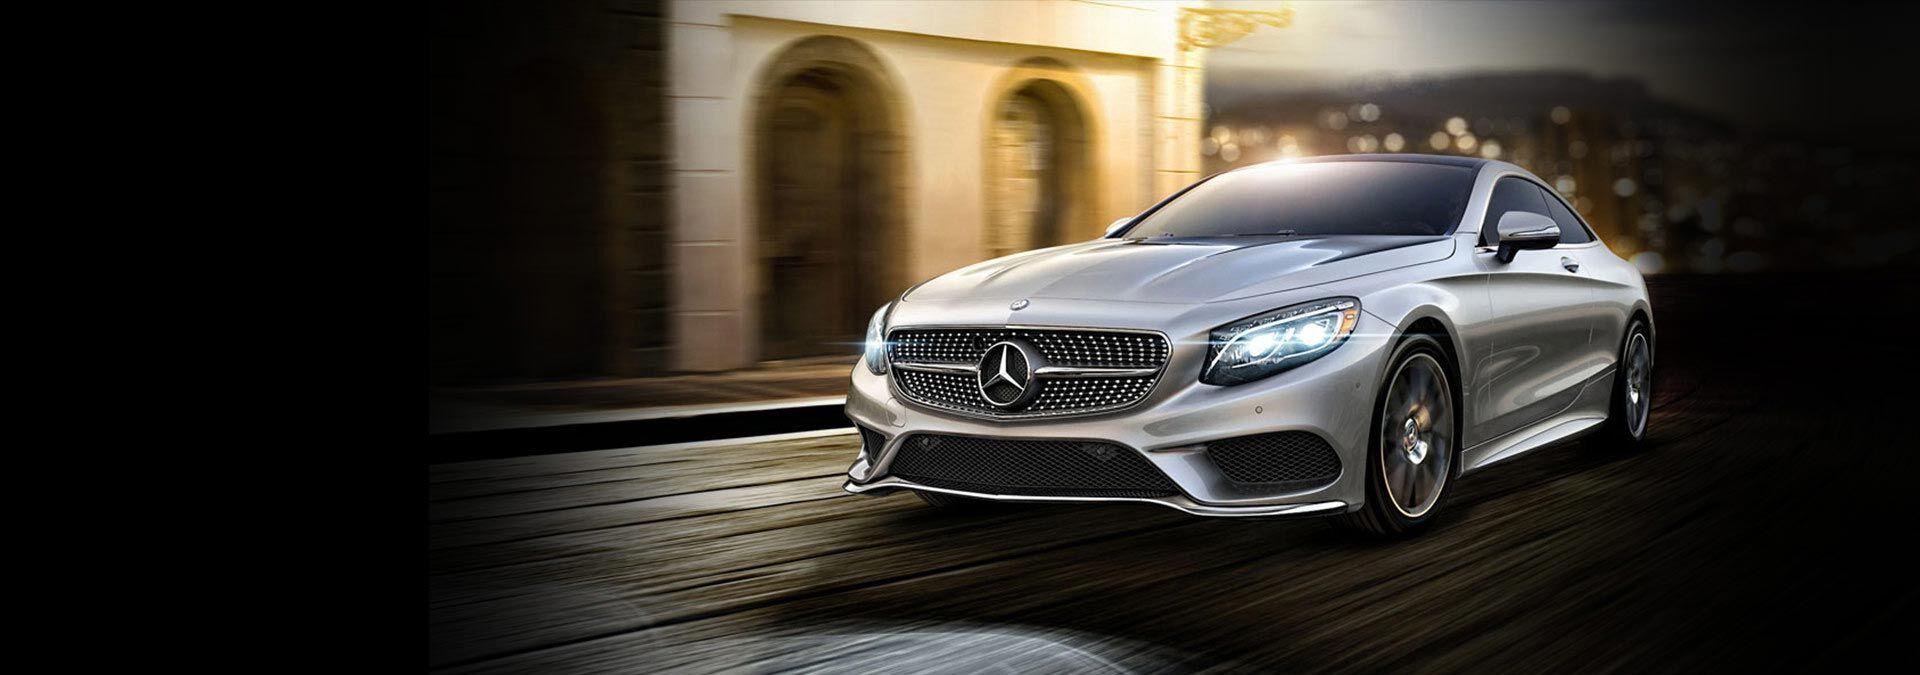 Mercedes Benz Dealership In Salisbury Md Mercedes Benz